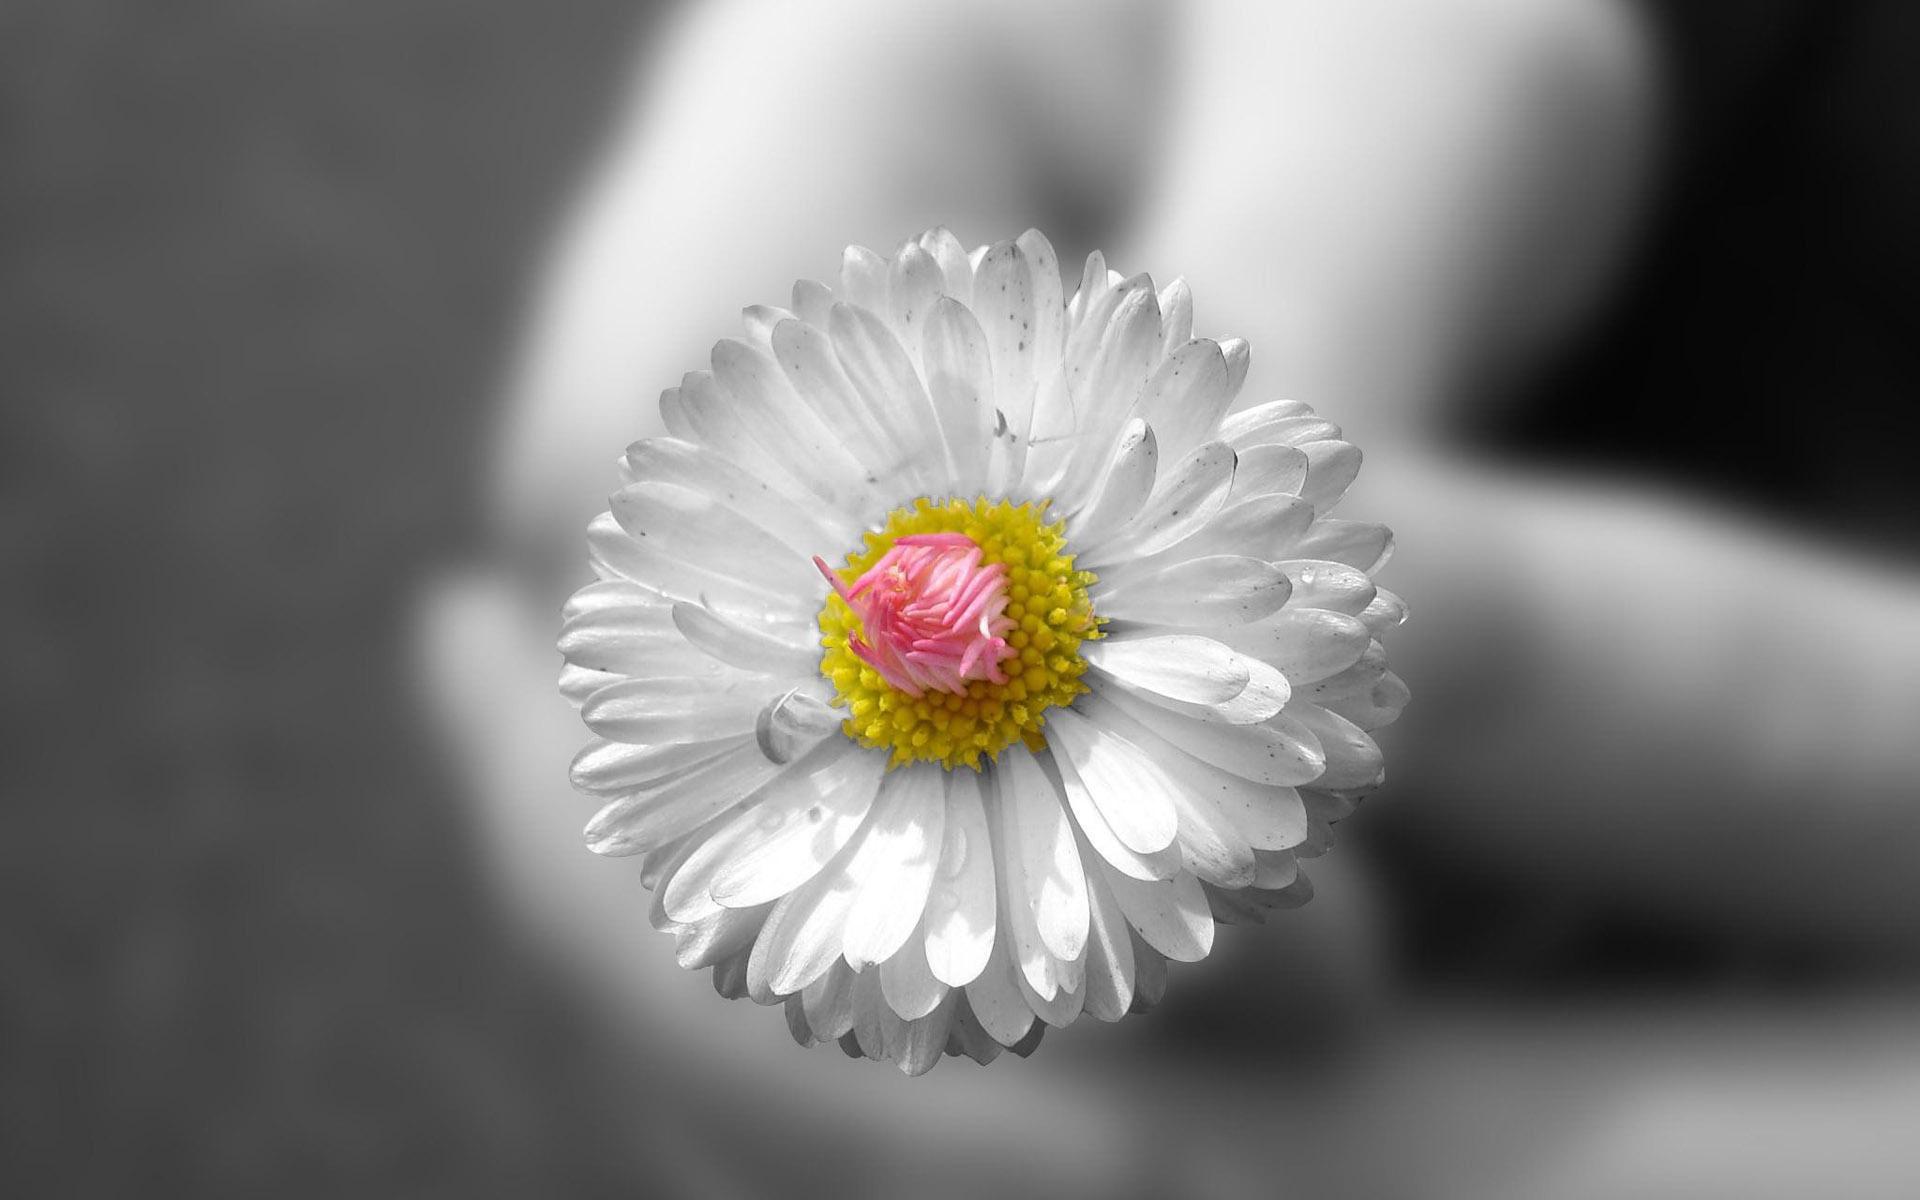 Happy First Day of Spring White Dahlia 1920x1200 Flower 1920x1200